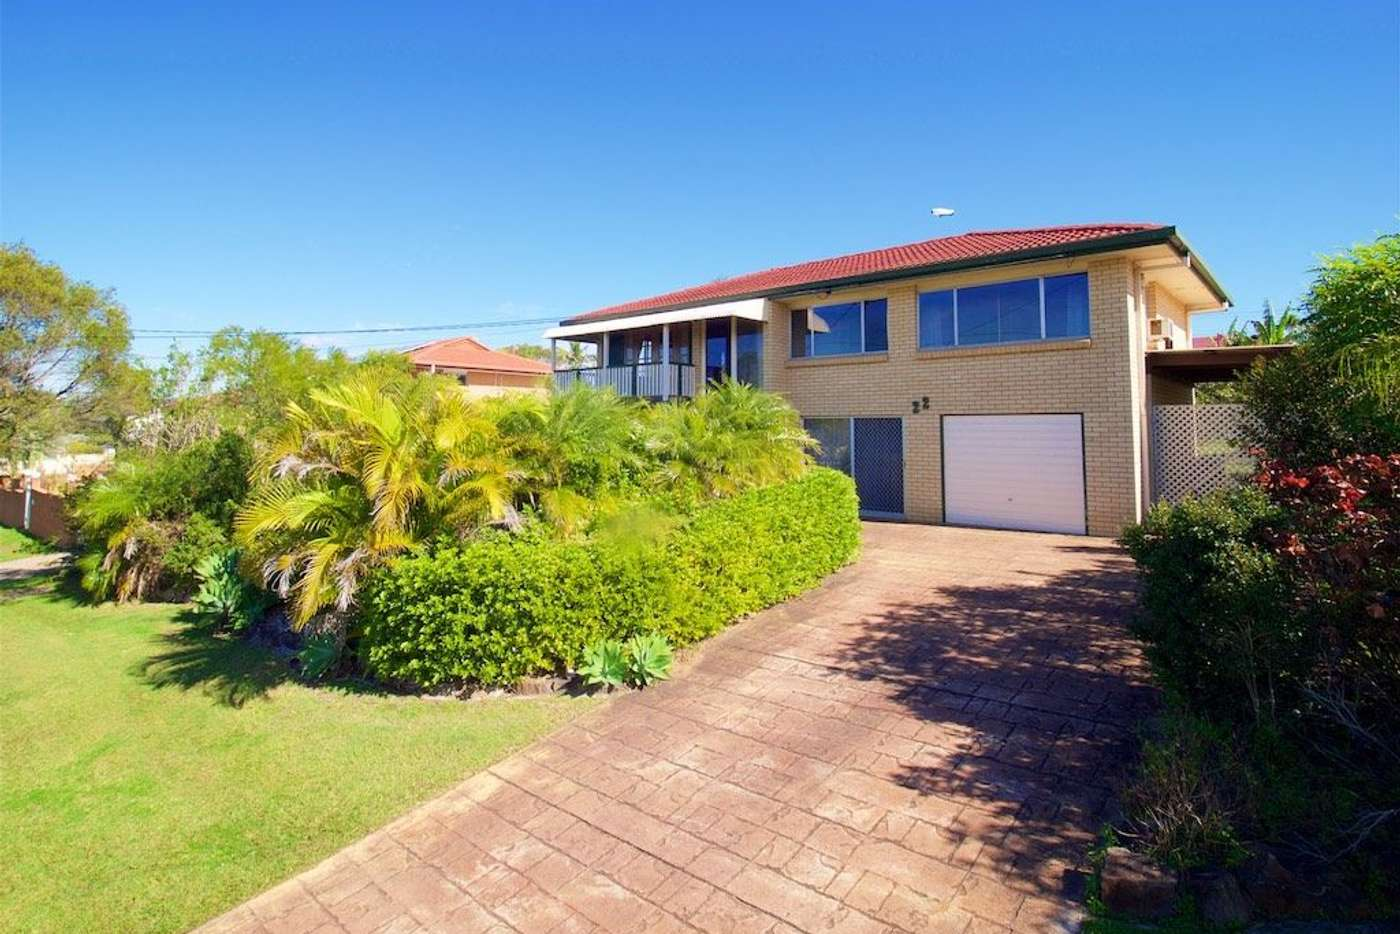 Main view of Homely house listing, 22 Meribah Street, Shailer Park QLD 4128